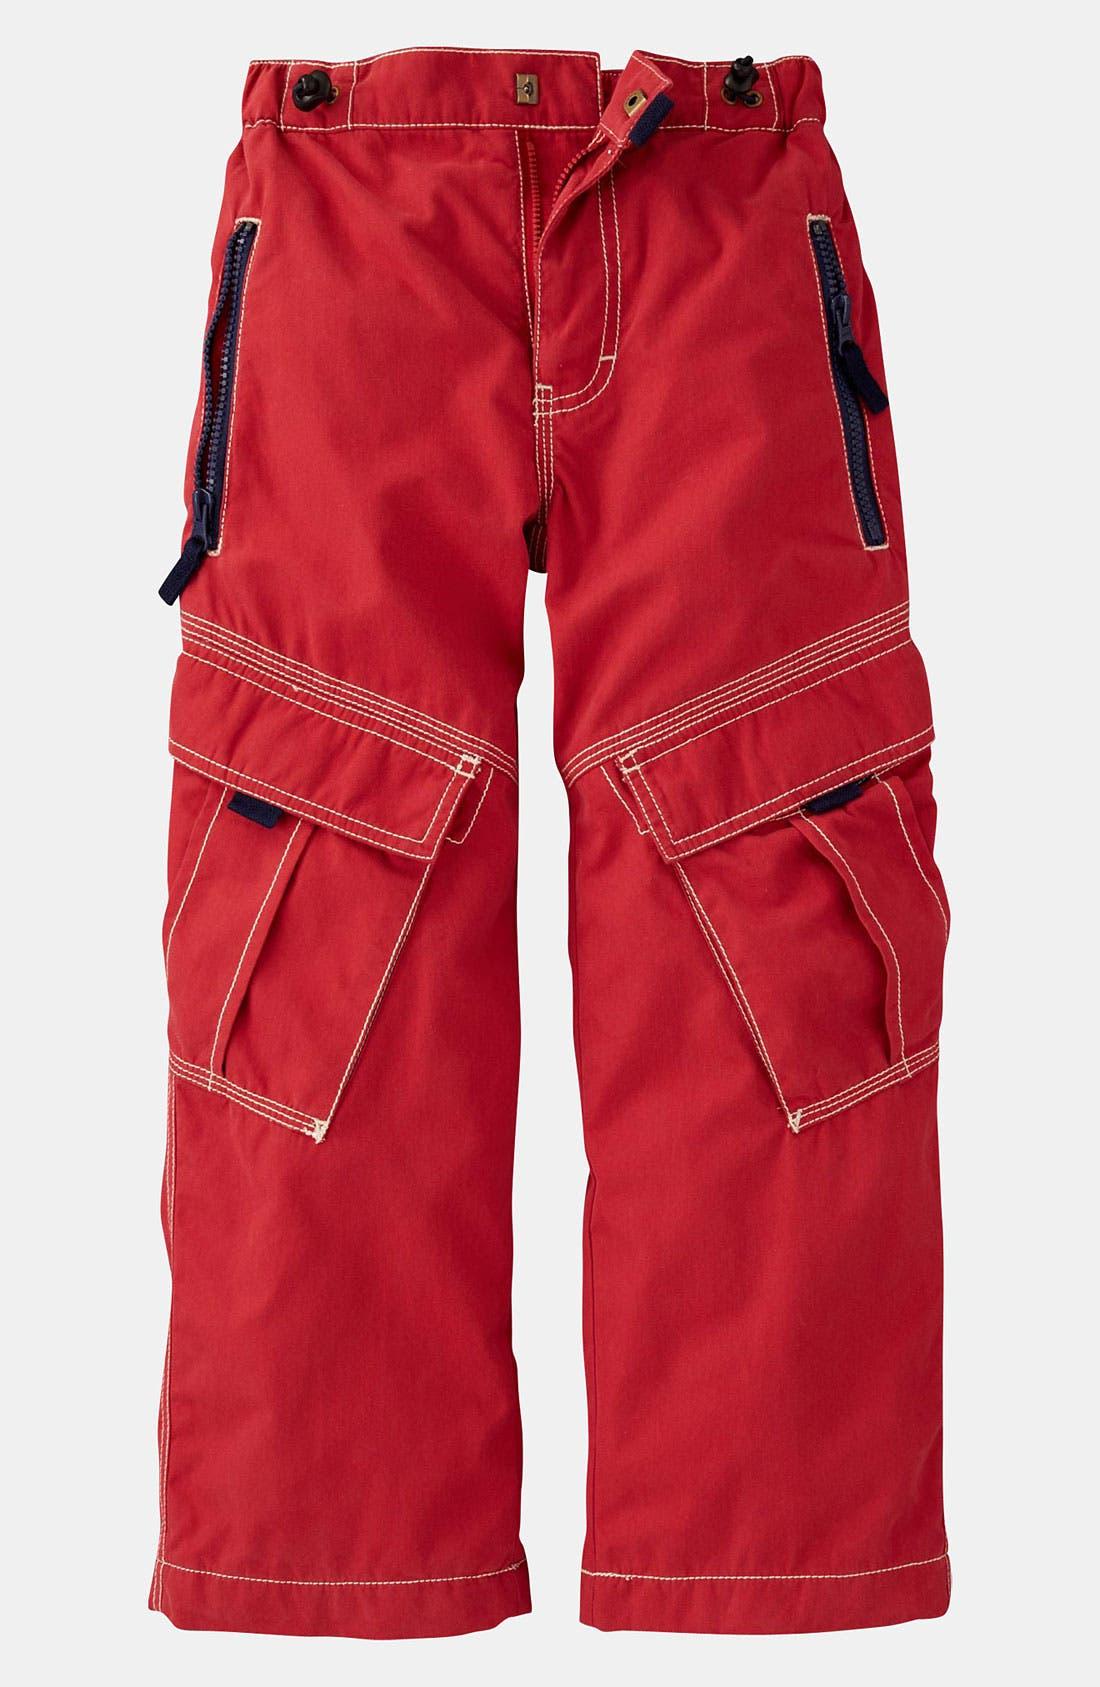 Main Image - Mini Boden 'Skate' Cargo Pants (Little Boys & Big Boys)